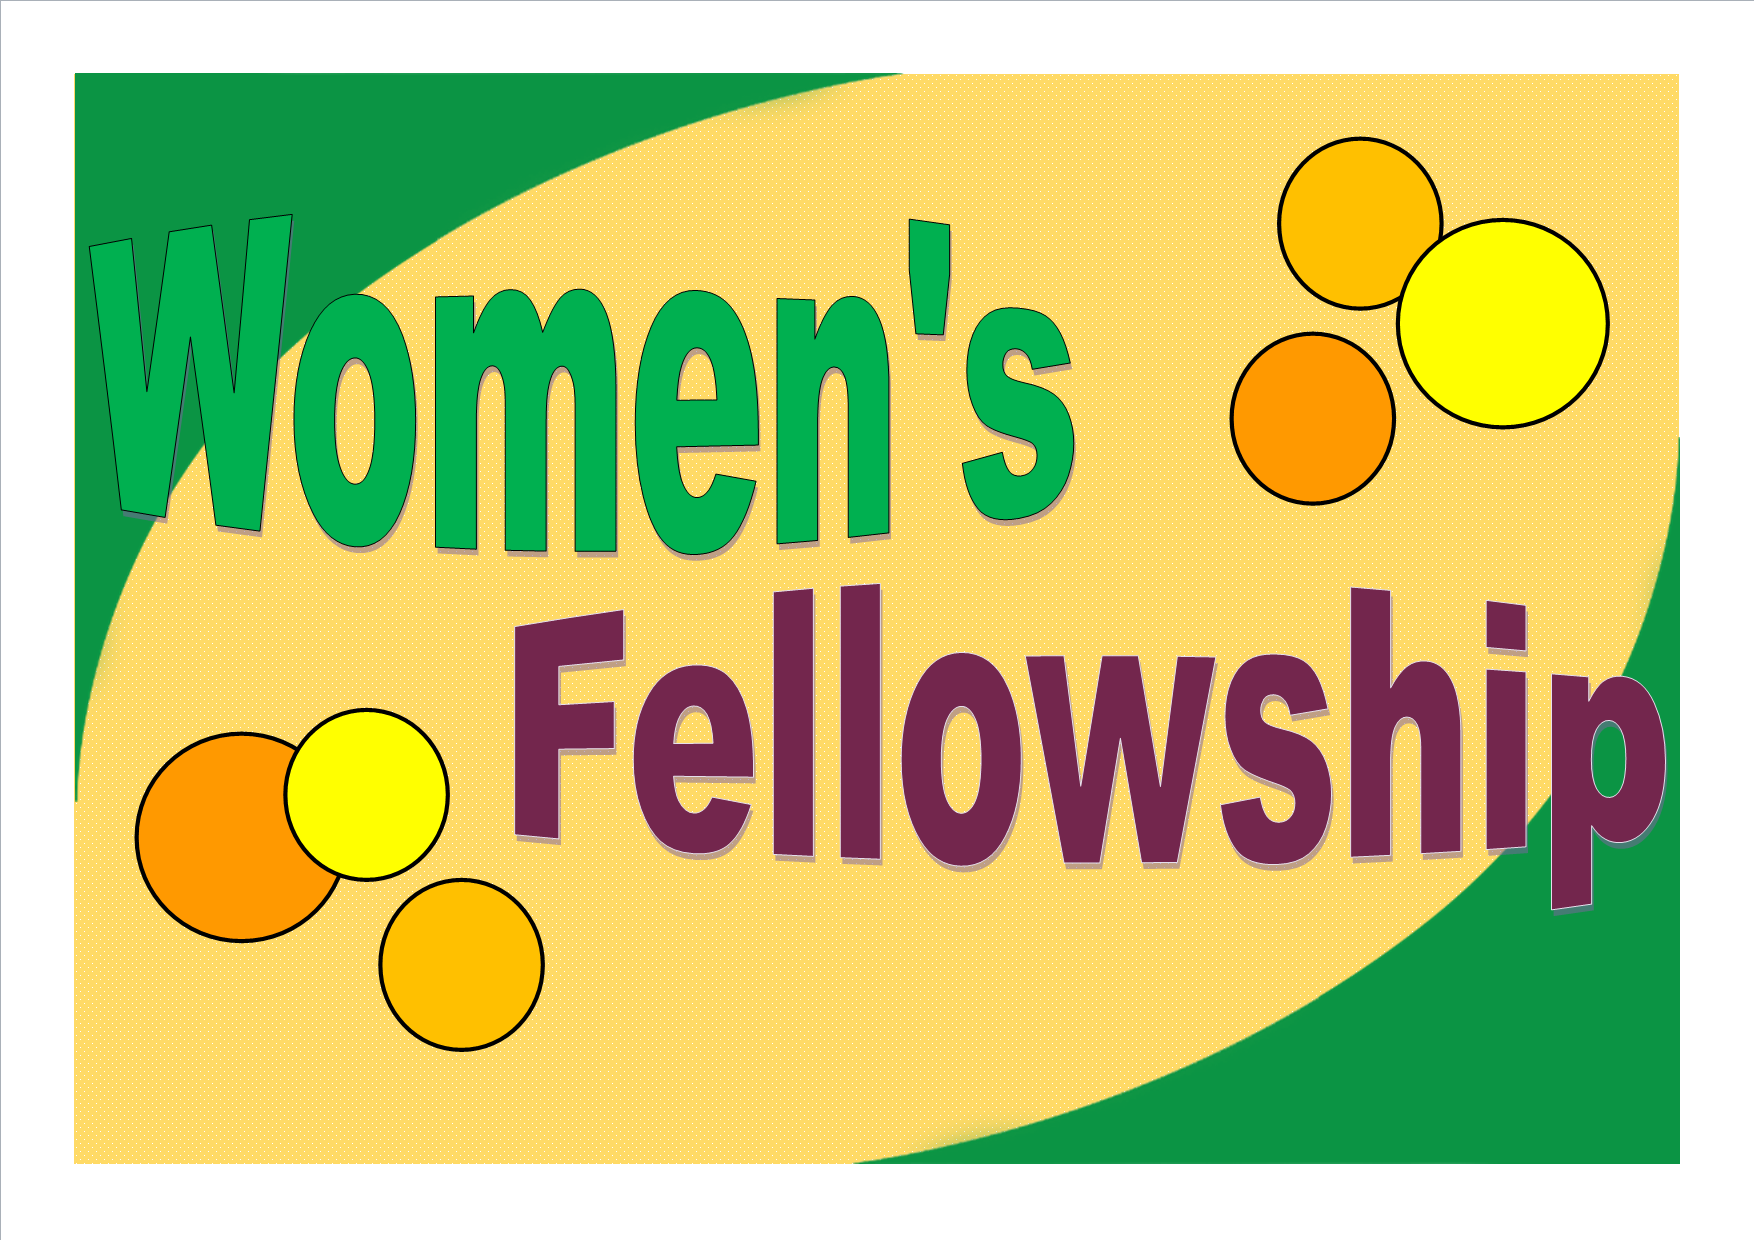 Women's Fellowship.png